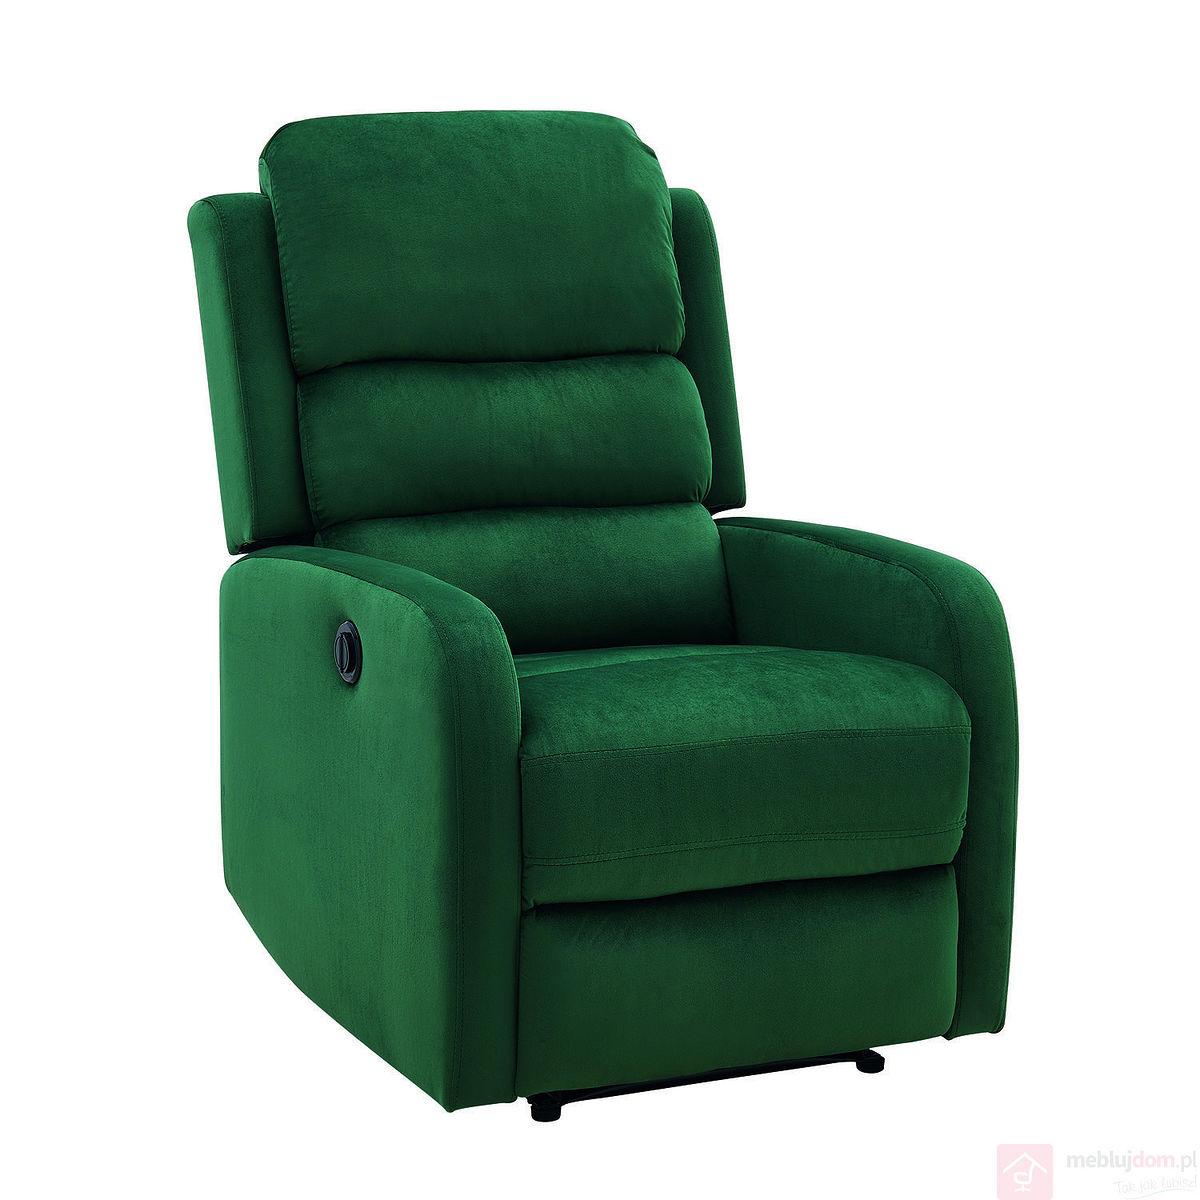 Fotel relaksacyjny PEGAZ VELVET Signal zielony